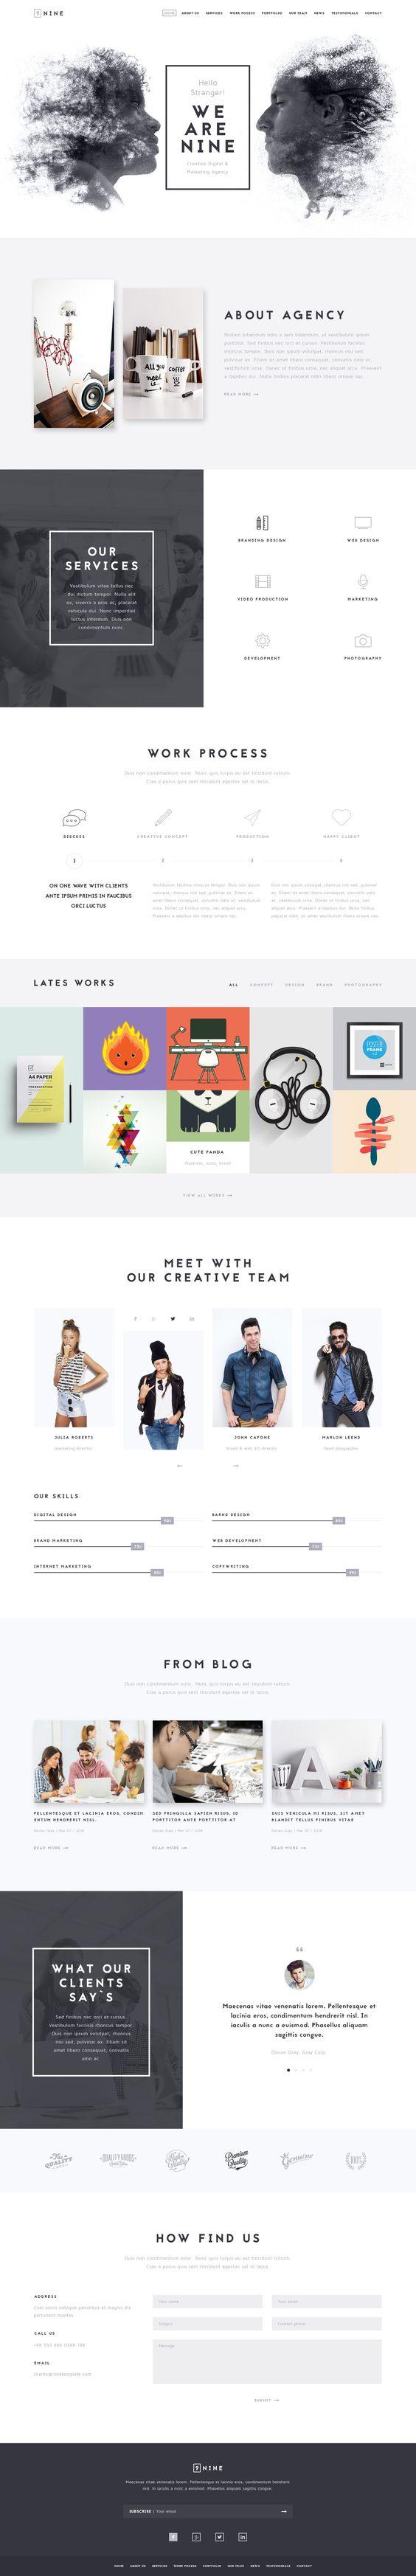 12+ Best Simple WordPress Themes of 2015